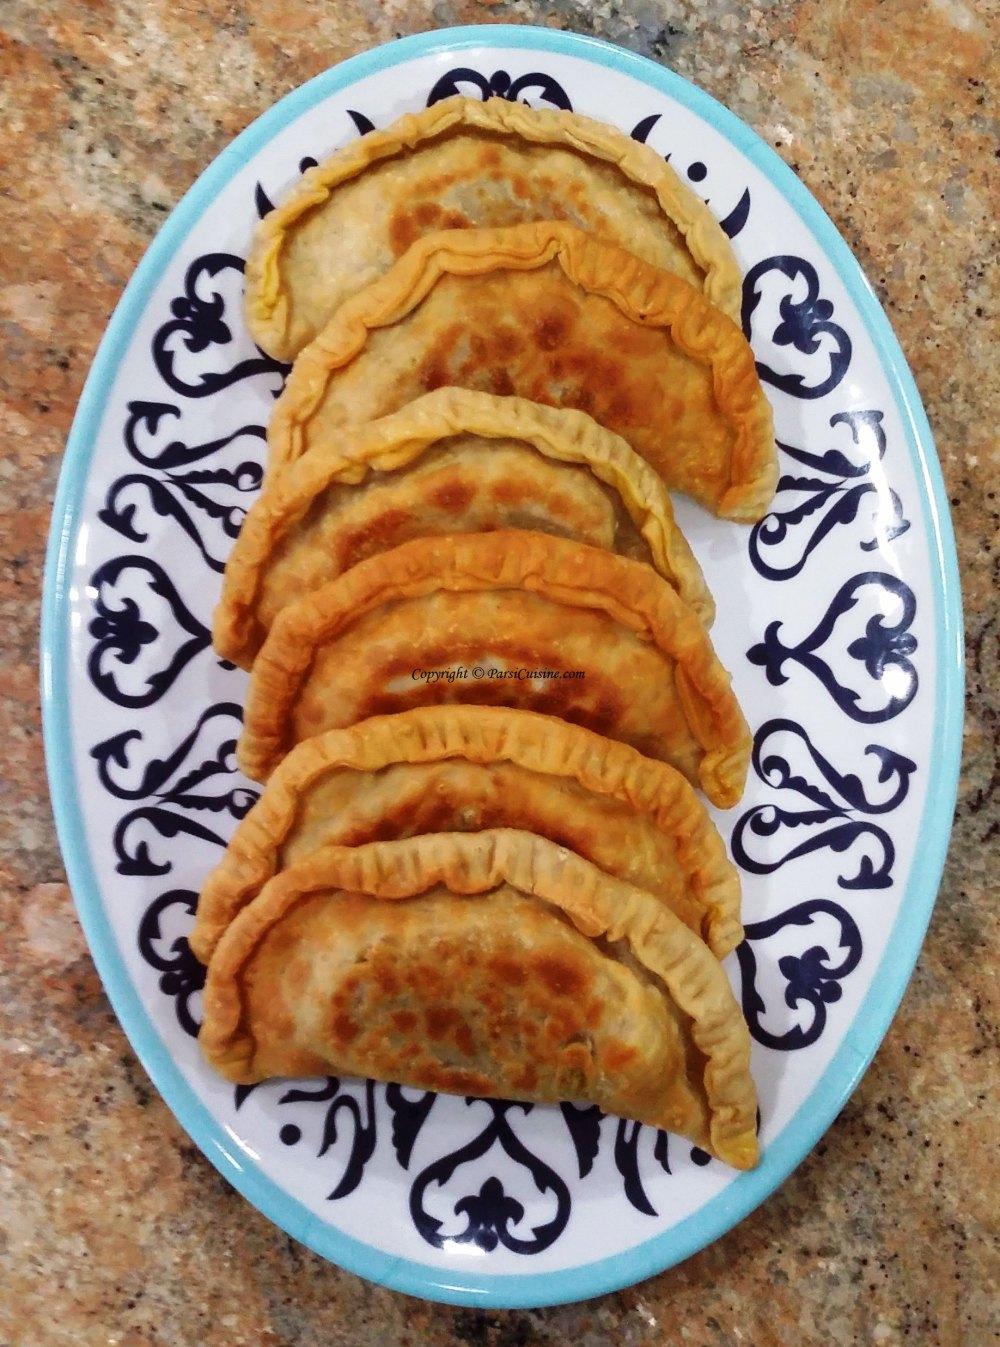 Drain on paper towels and serve Empanada hot.